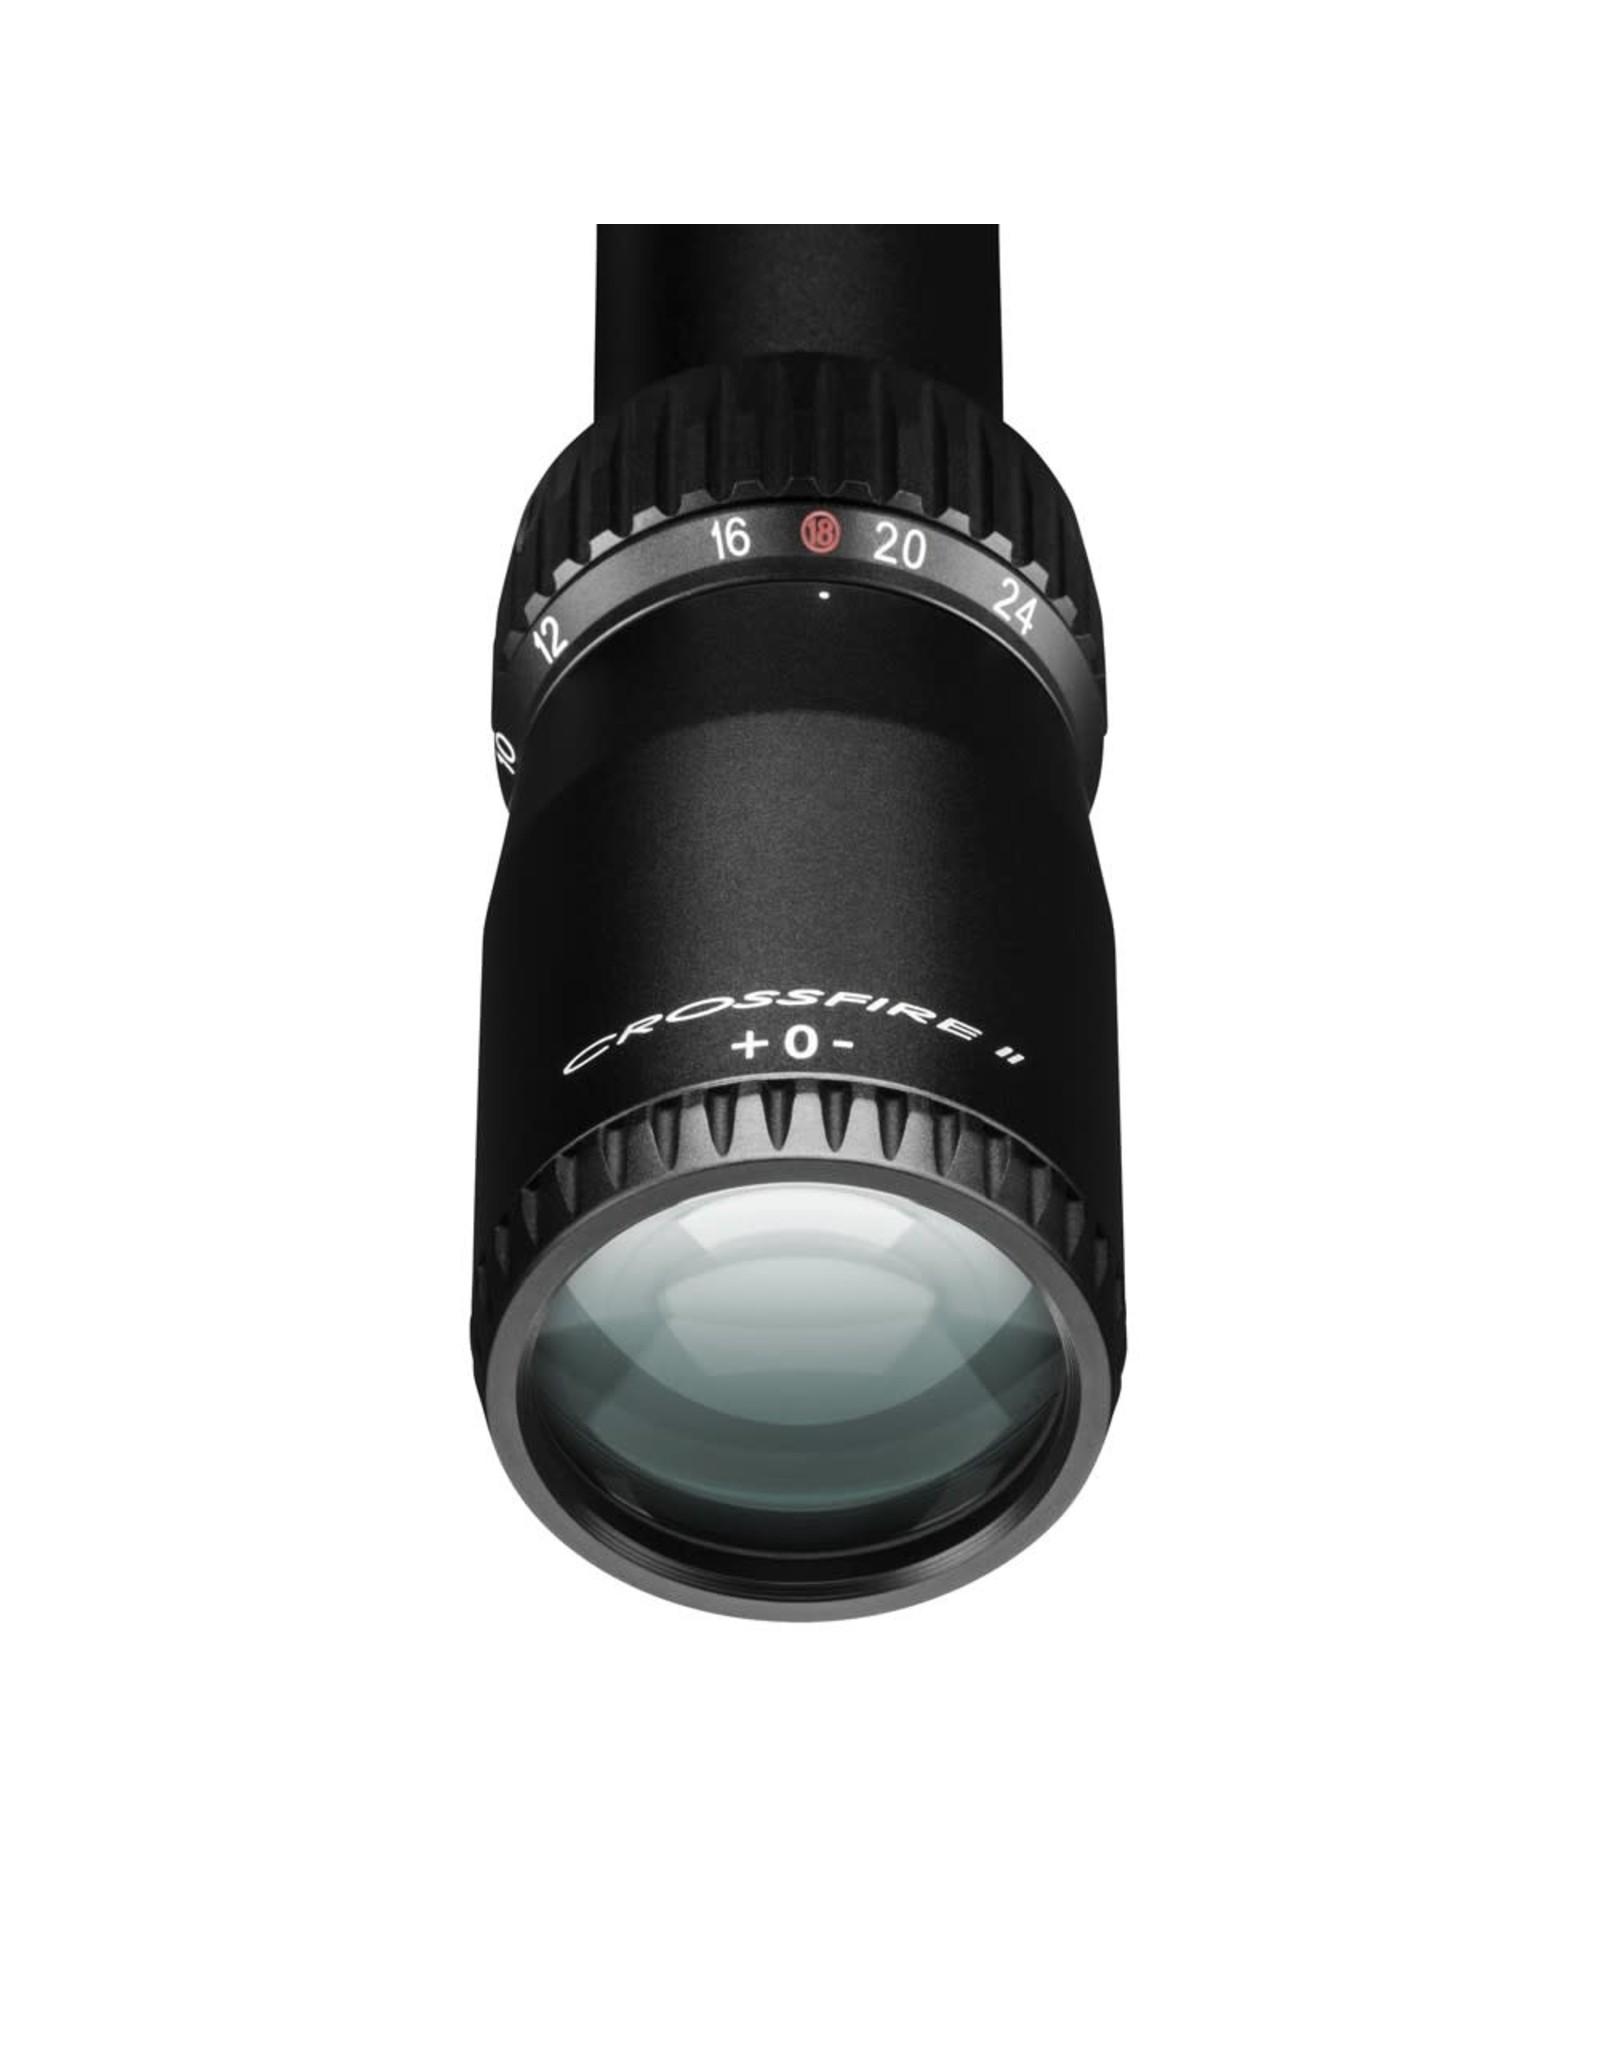 Vortex Optics VORTEX CROSSFIRE II 6-24x50 RIFLESCOPE (30mm) DEAD-HOLD BDC # VT-CF2-31045